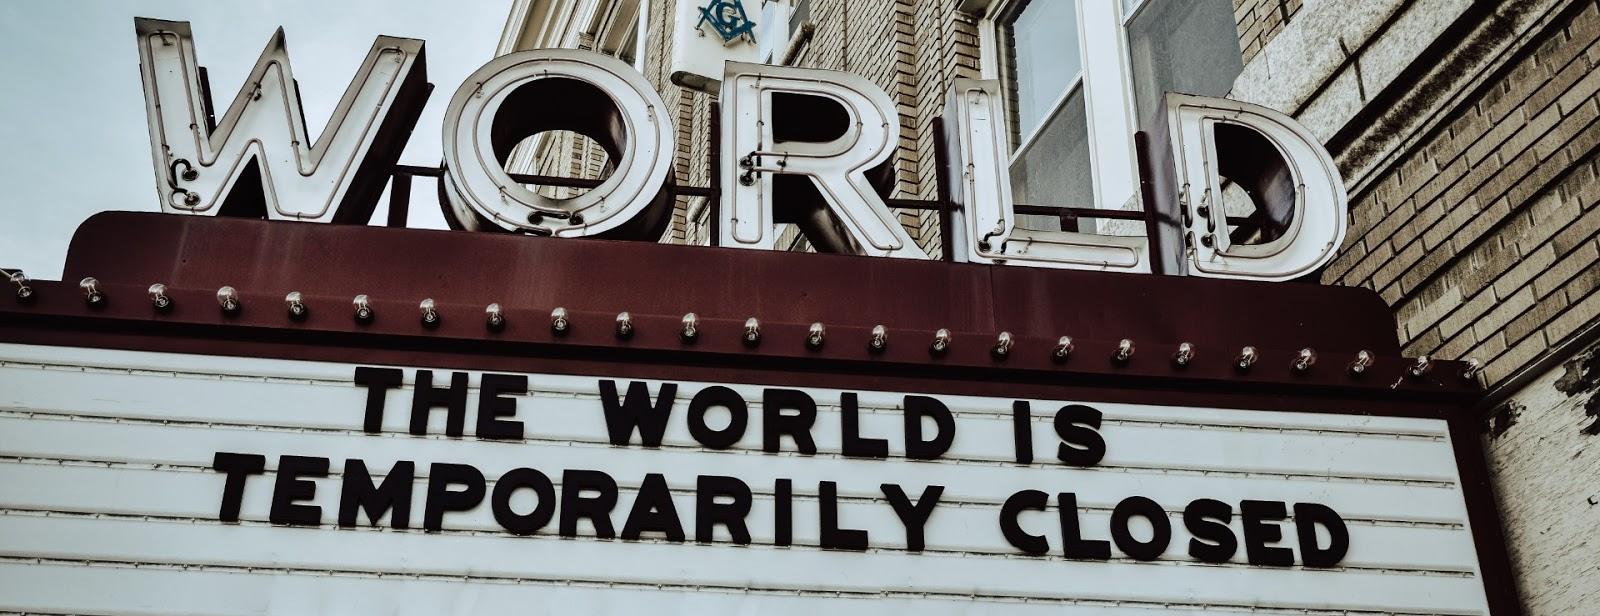 World temporary closed